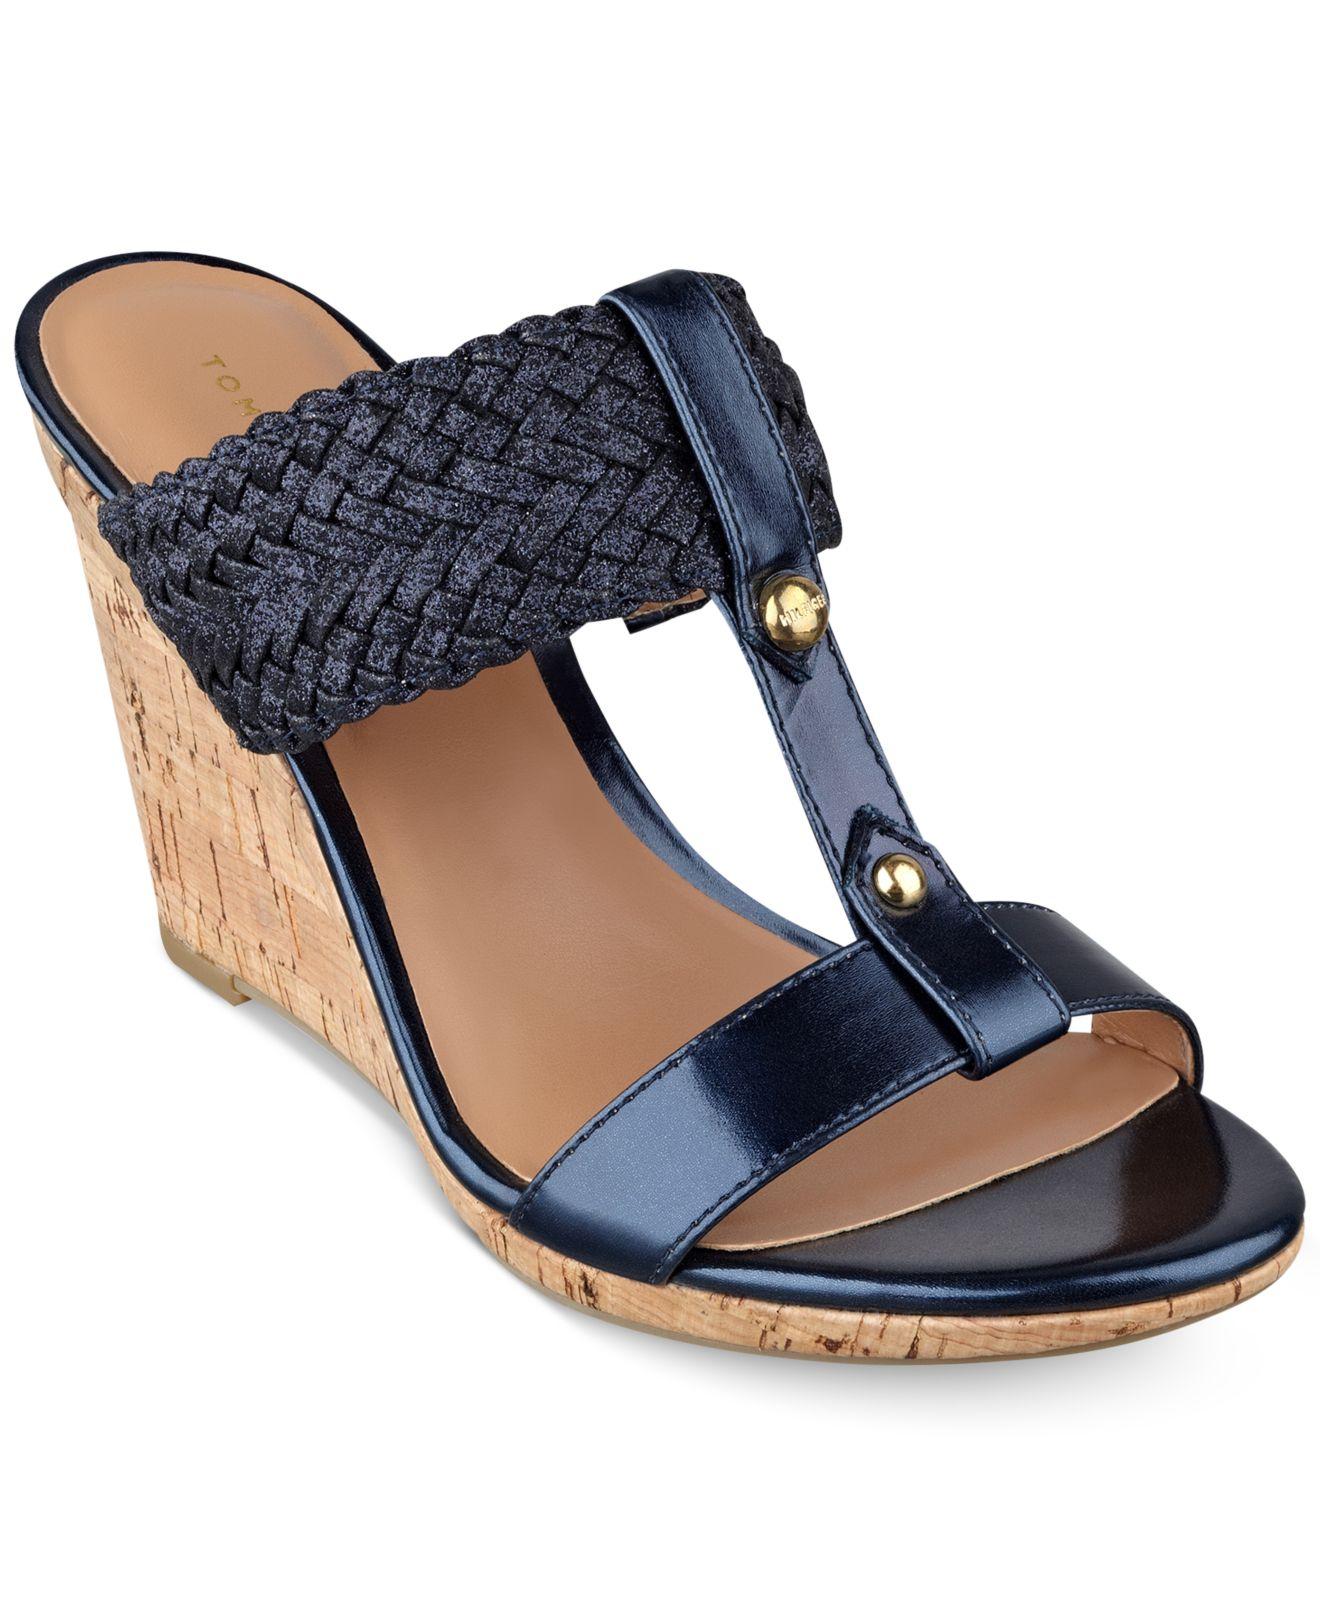 681058478 Lyst - Tommy Hilfiger Women s Eleona Wedge Sandals in Blue